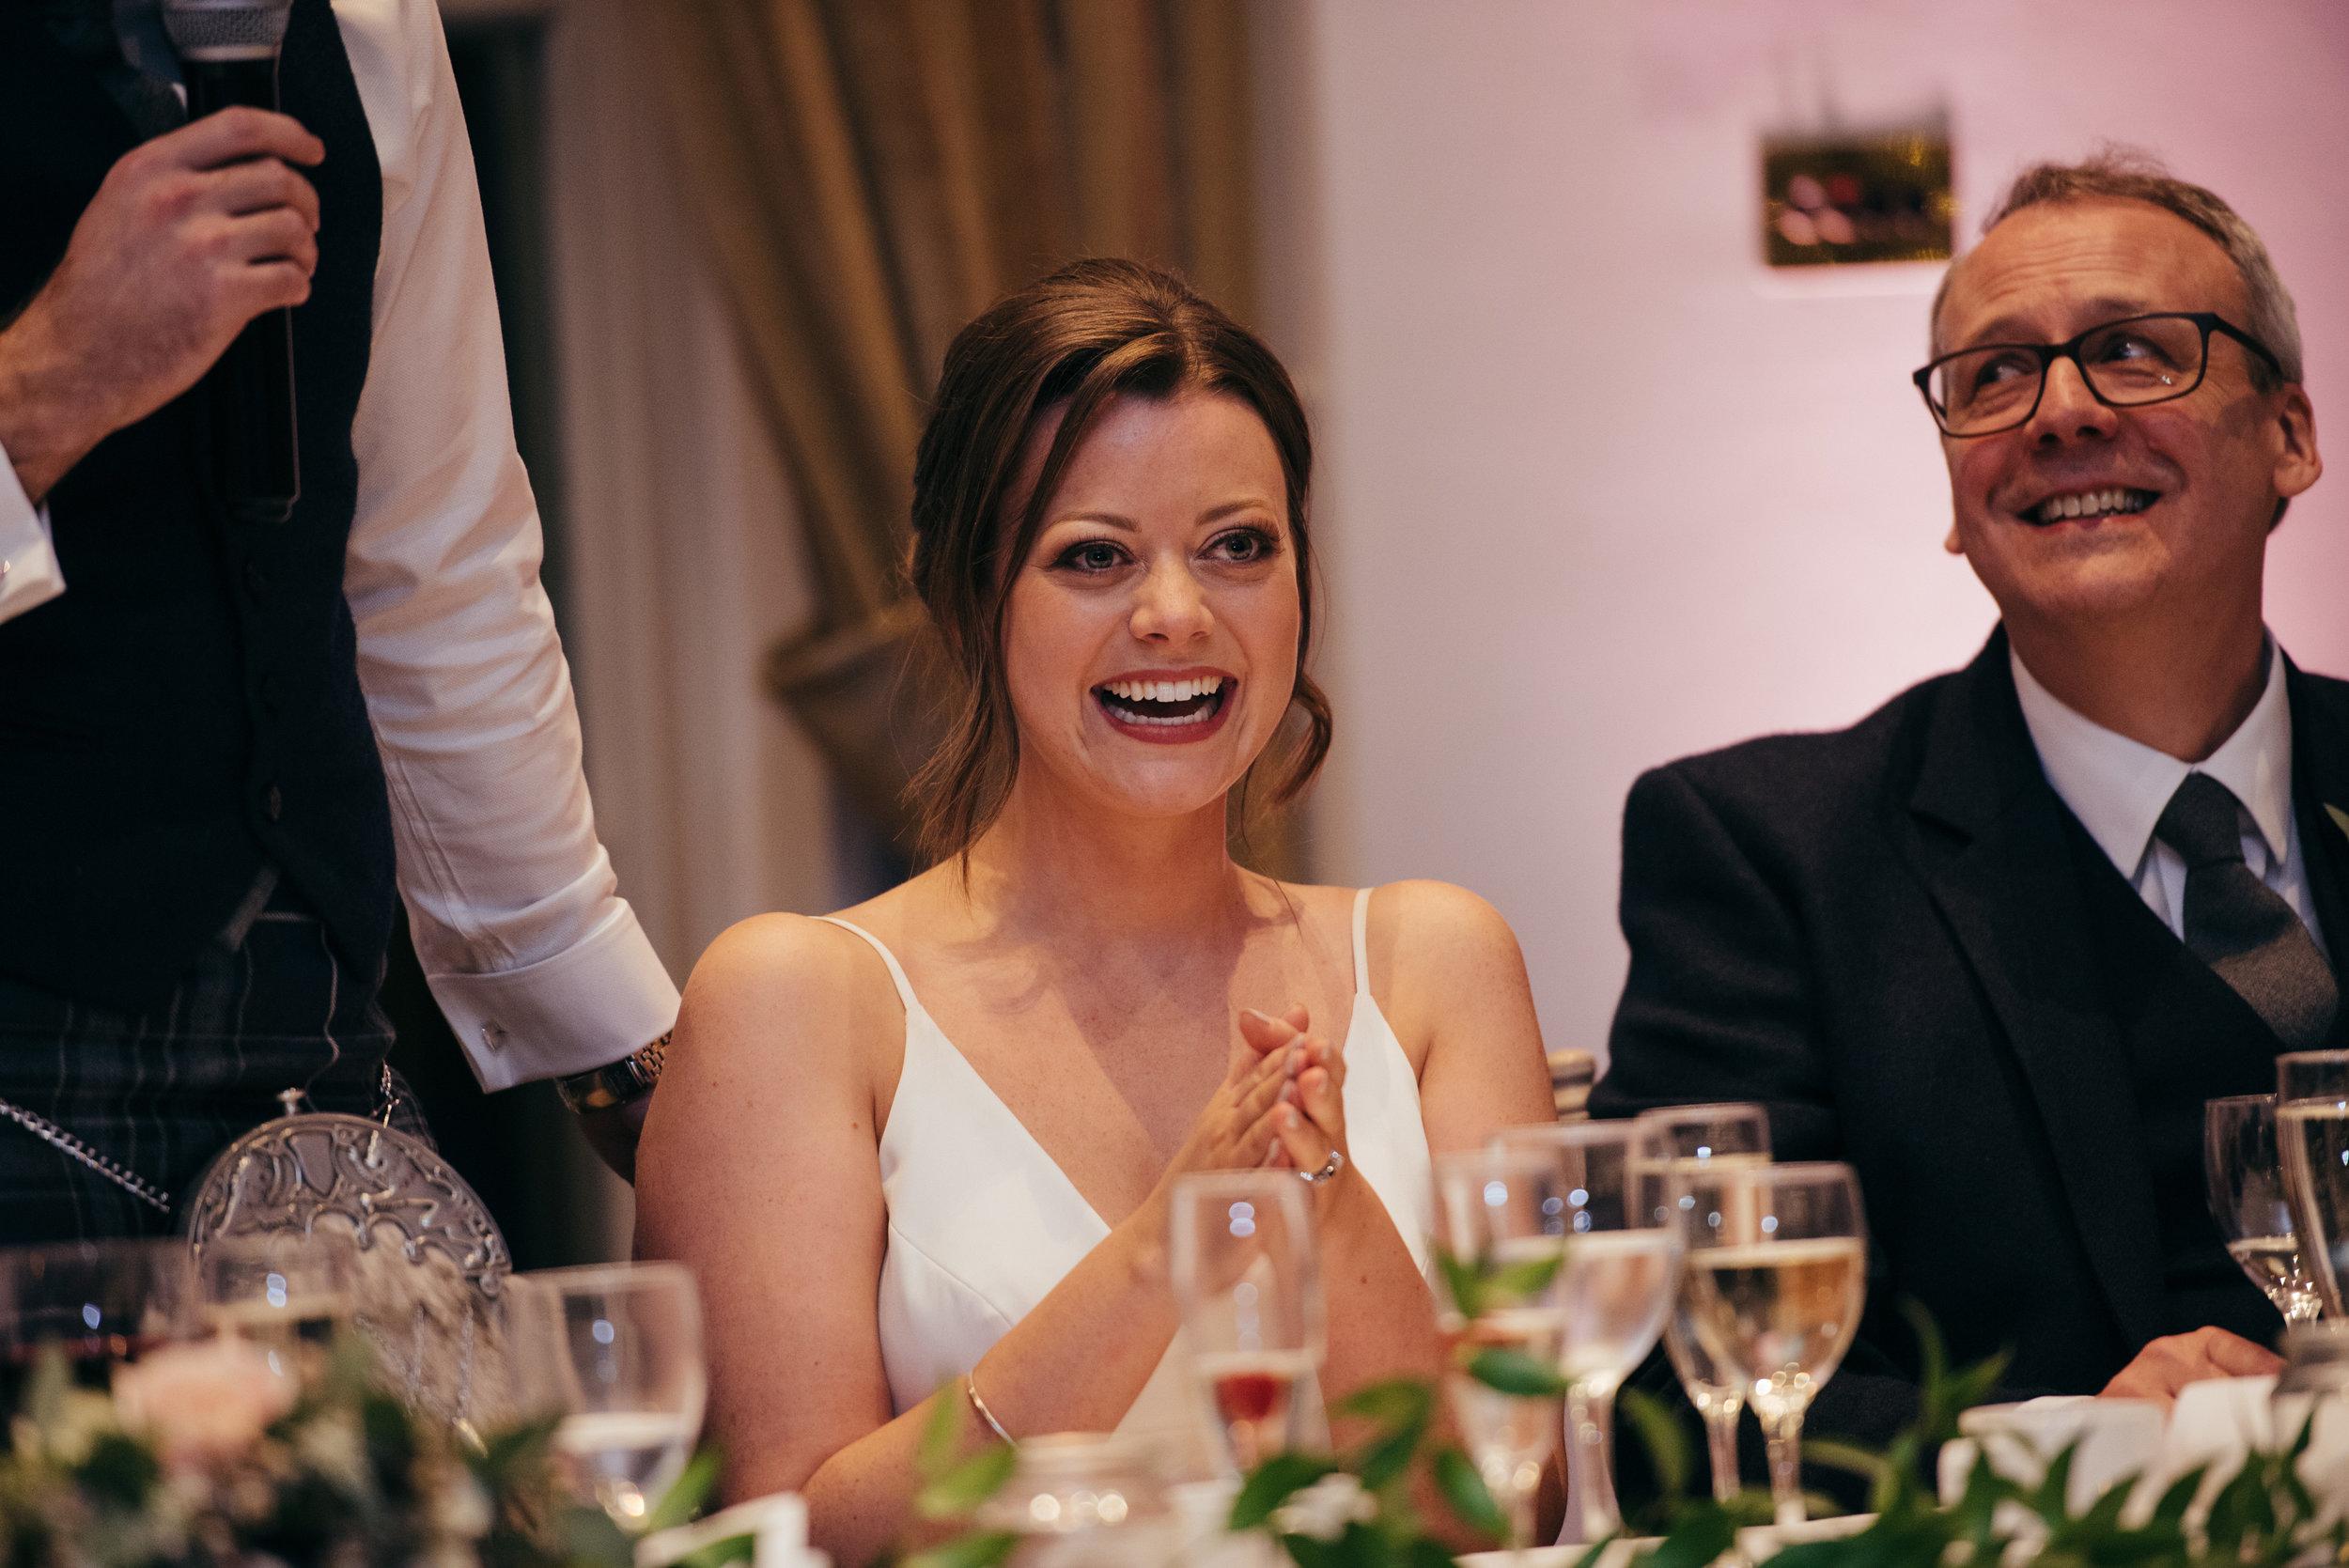 S&D(wedding)581.jpg